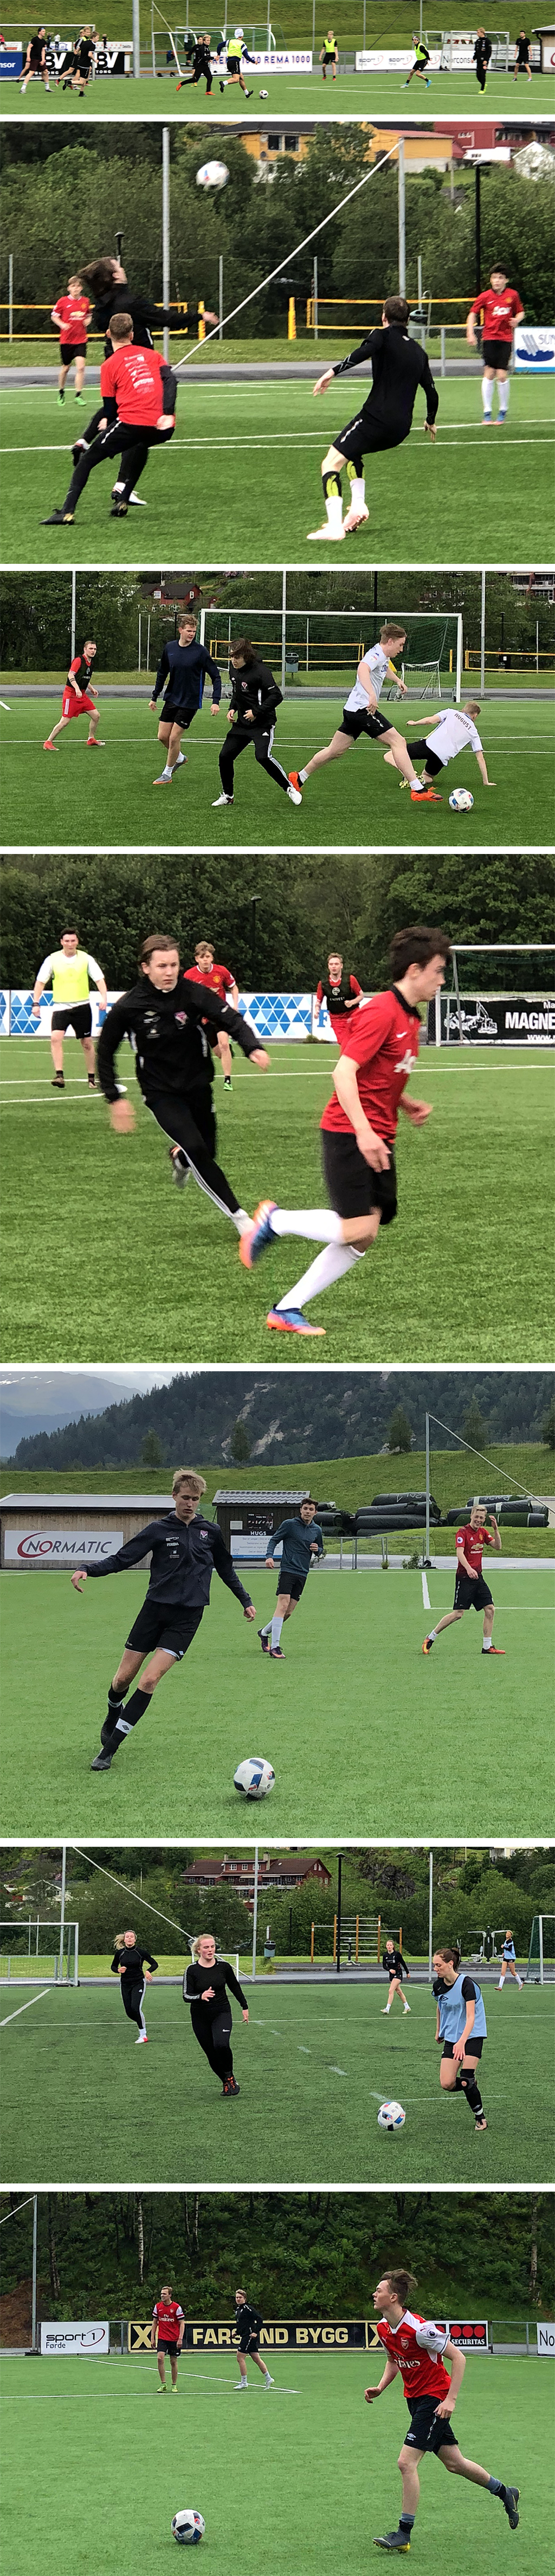 03 Fotball.jpg